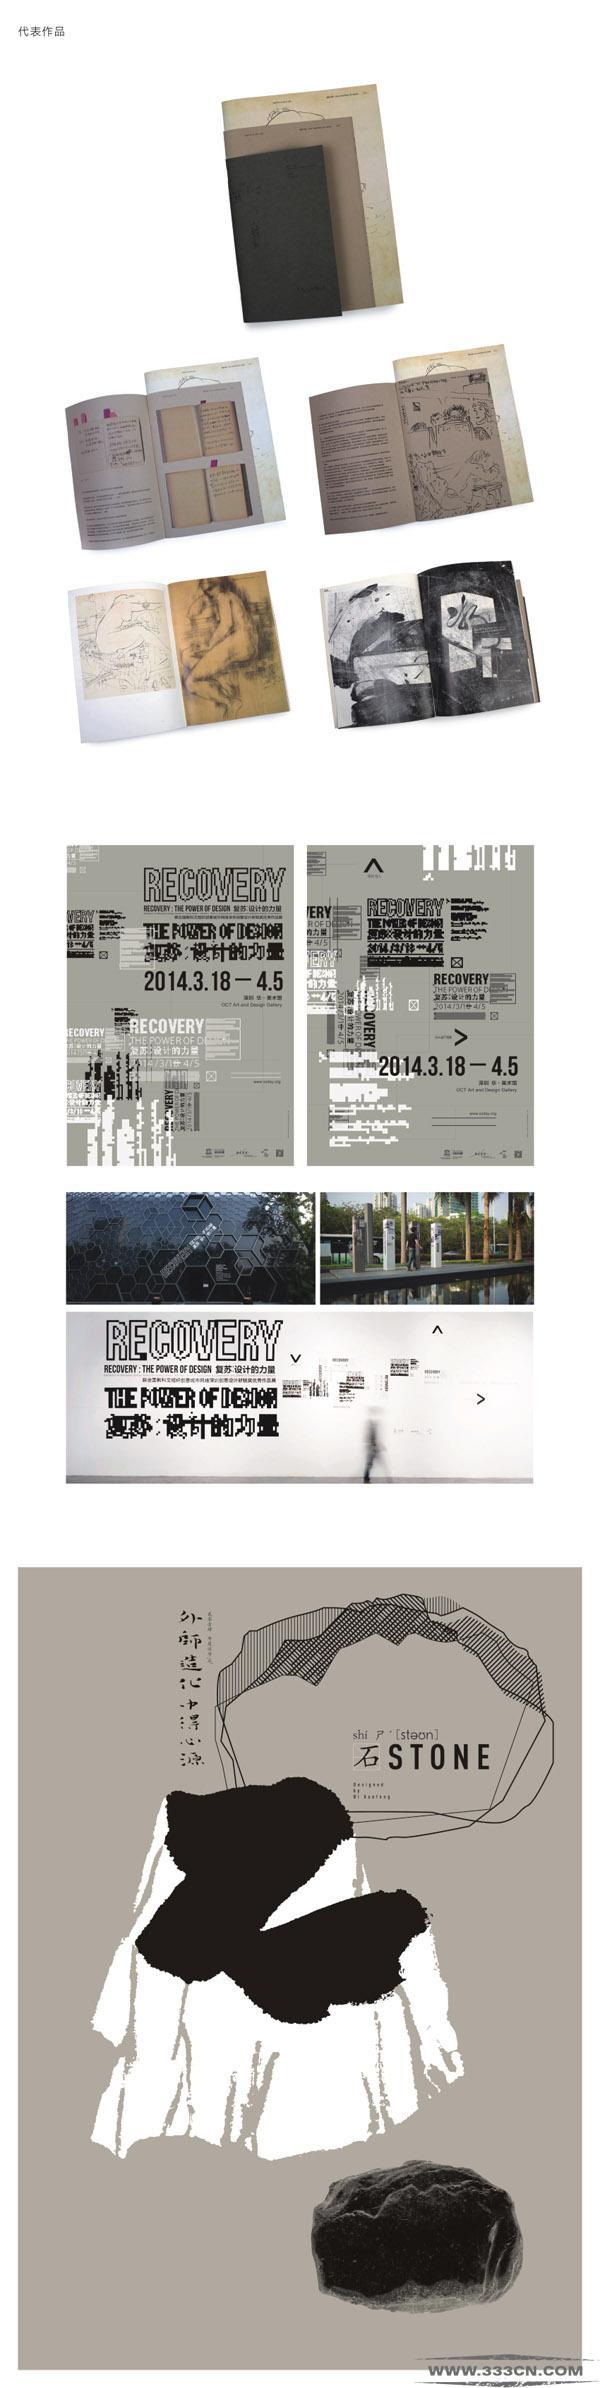 GDC-Show 在杭州 中国美术学院 平面的拓展 平面设计在中国2015展